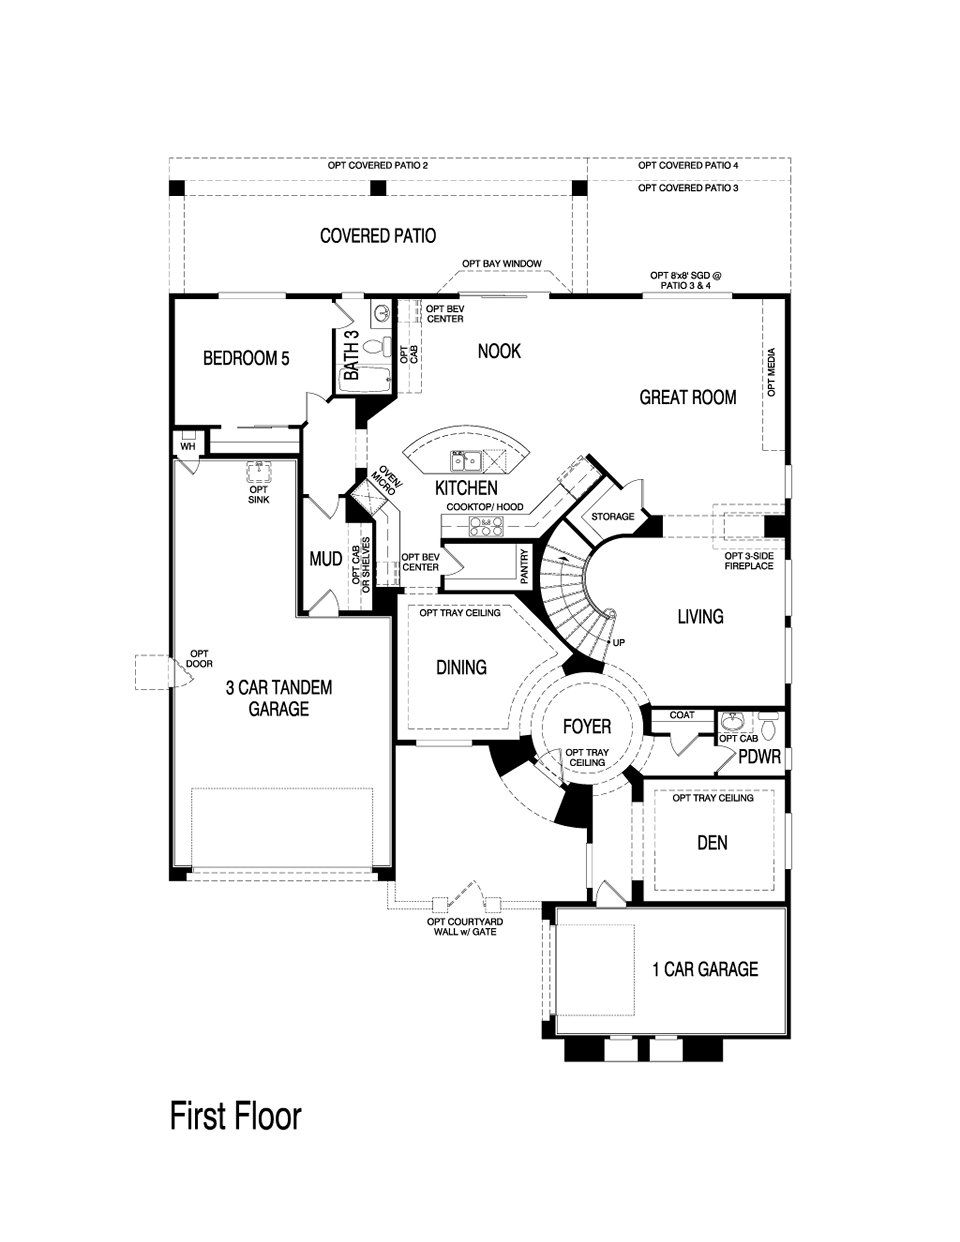 Amazing aspen house plans images best inspiration home for Aspen homes floor plans